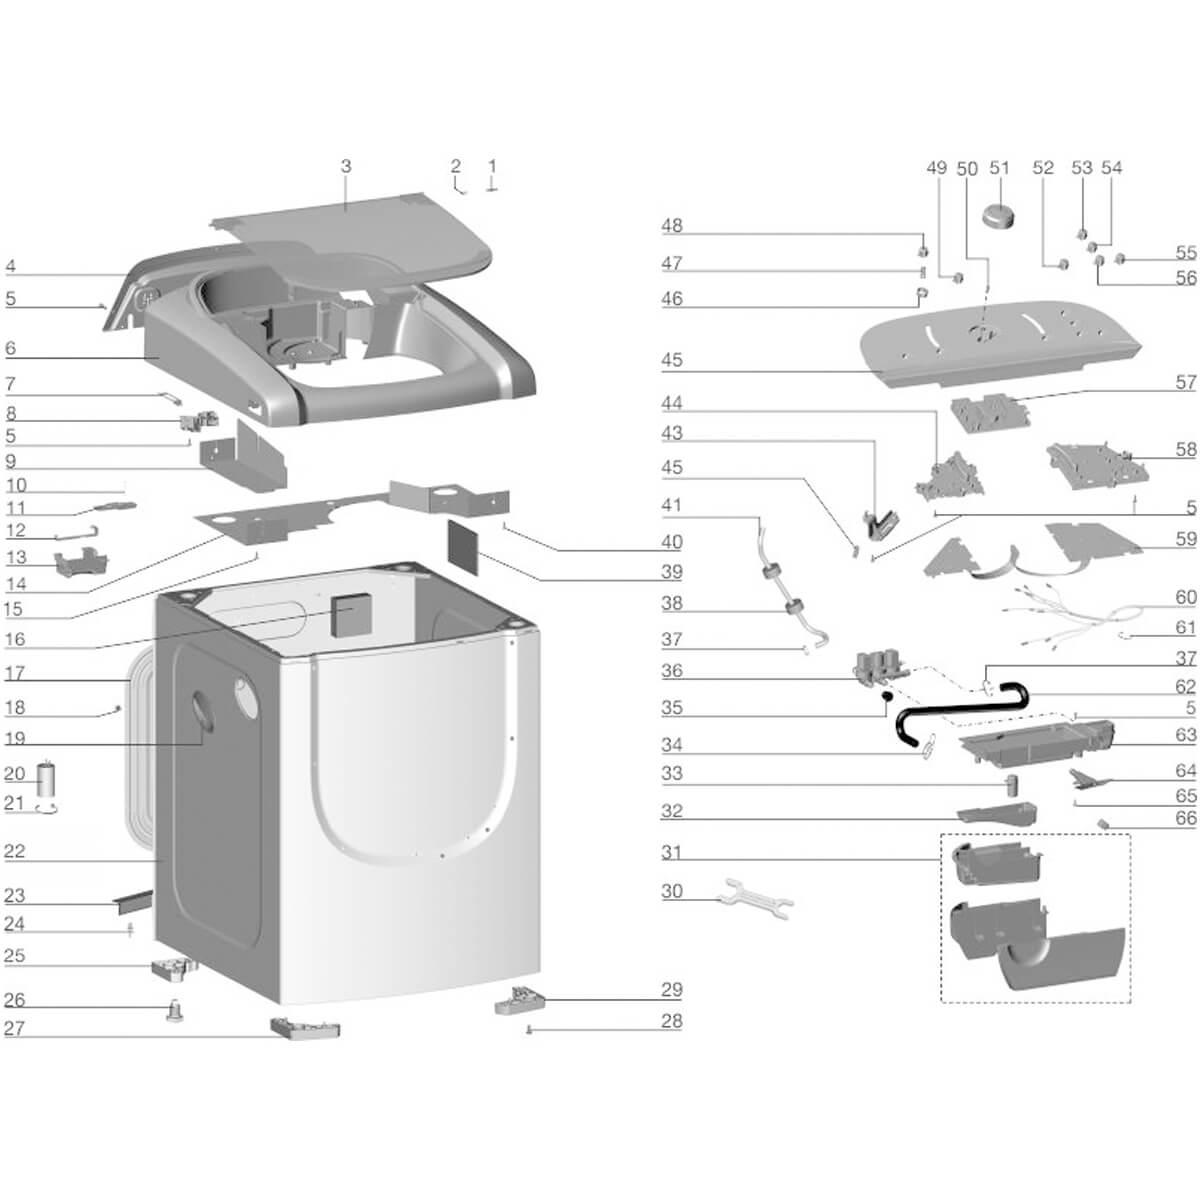 Placa De Potência Para Lavadora De Roupas Electrolux LTP15 - 70201778